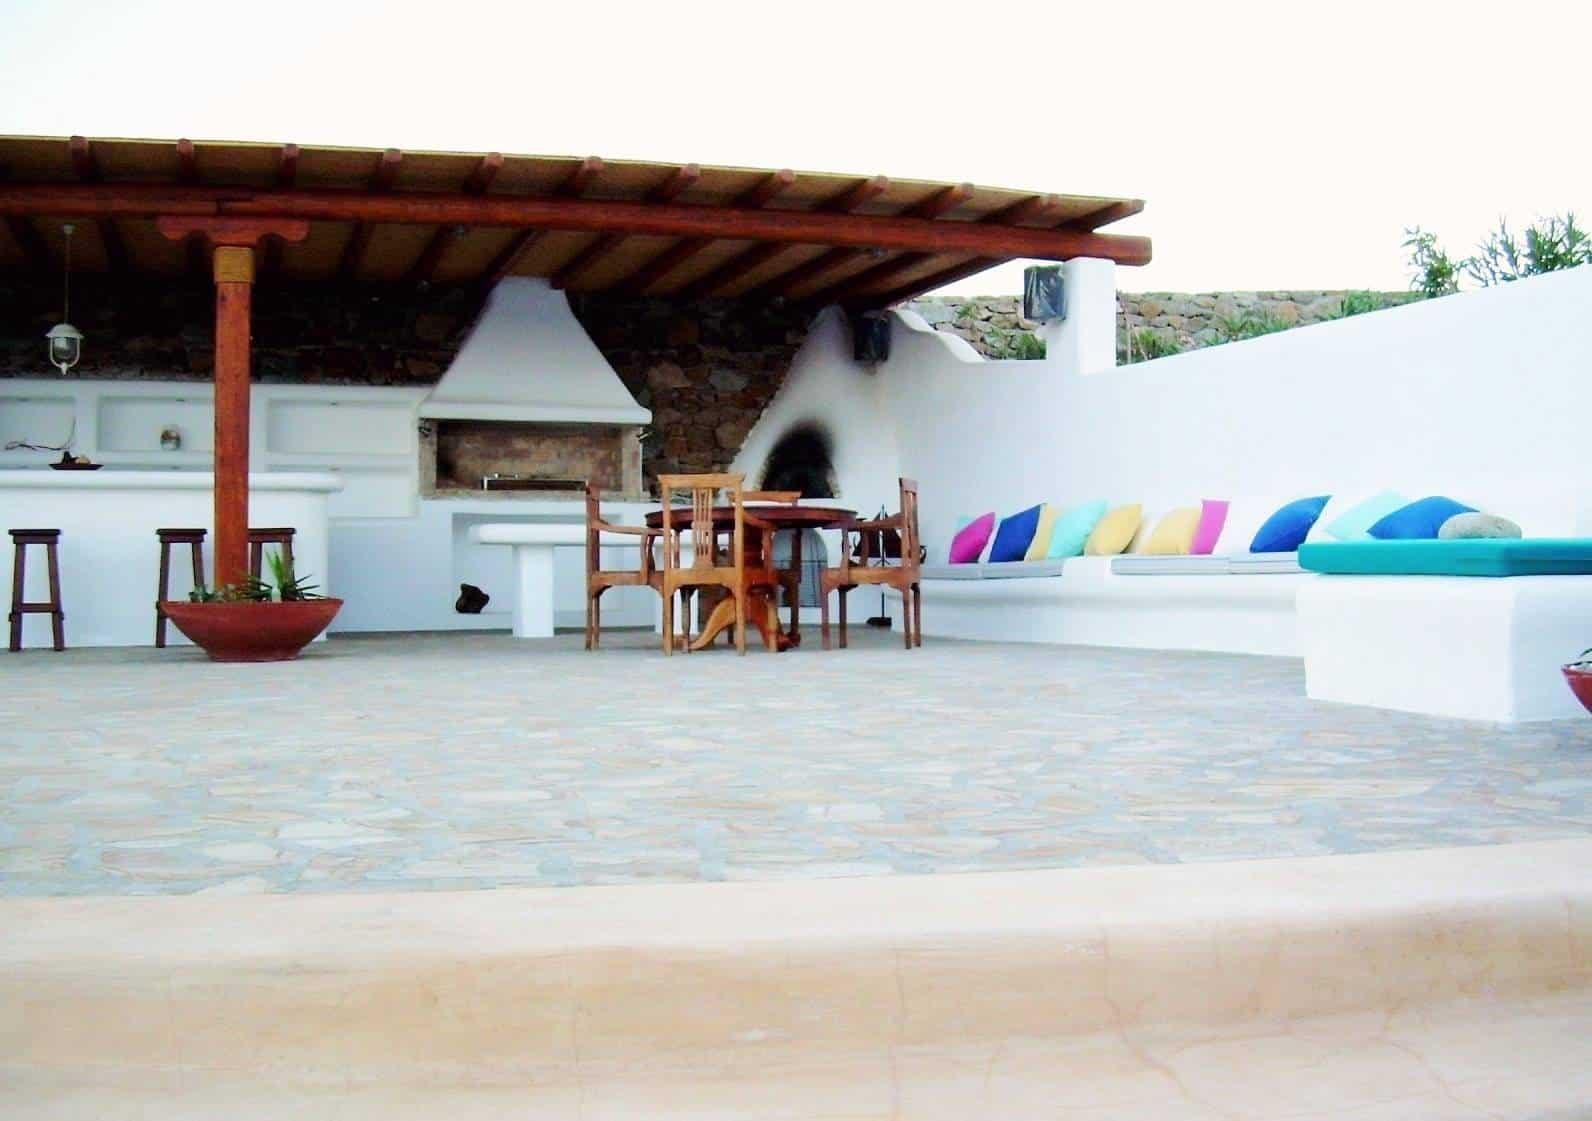 luxurious villa Mykonos - πολυτελής βίλα Μύκονος - mykonos services - οικοδομικές εργασίες 17